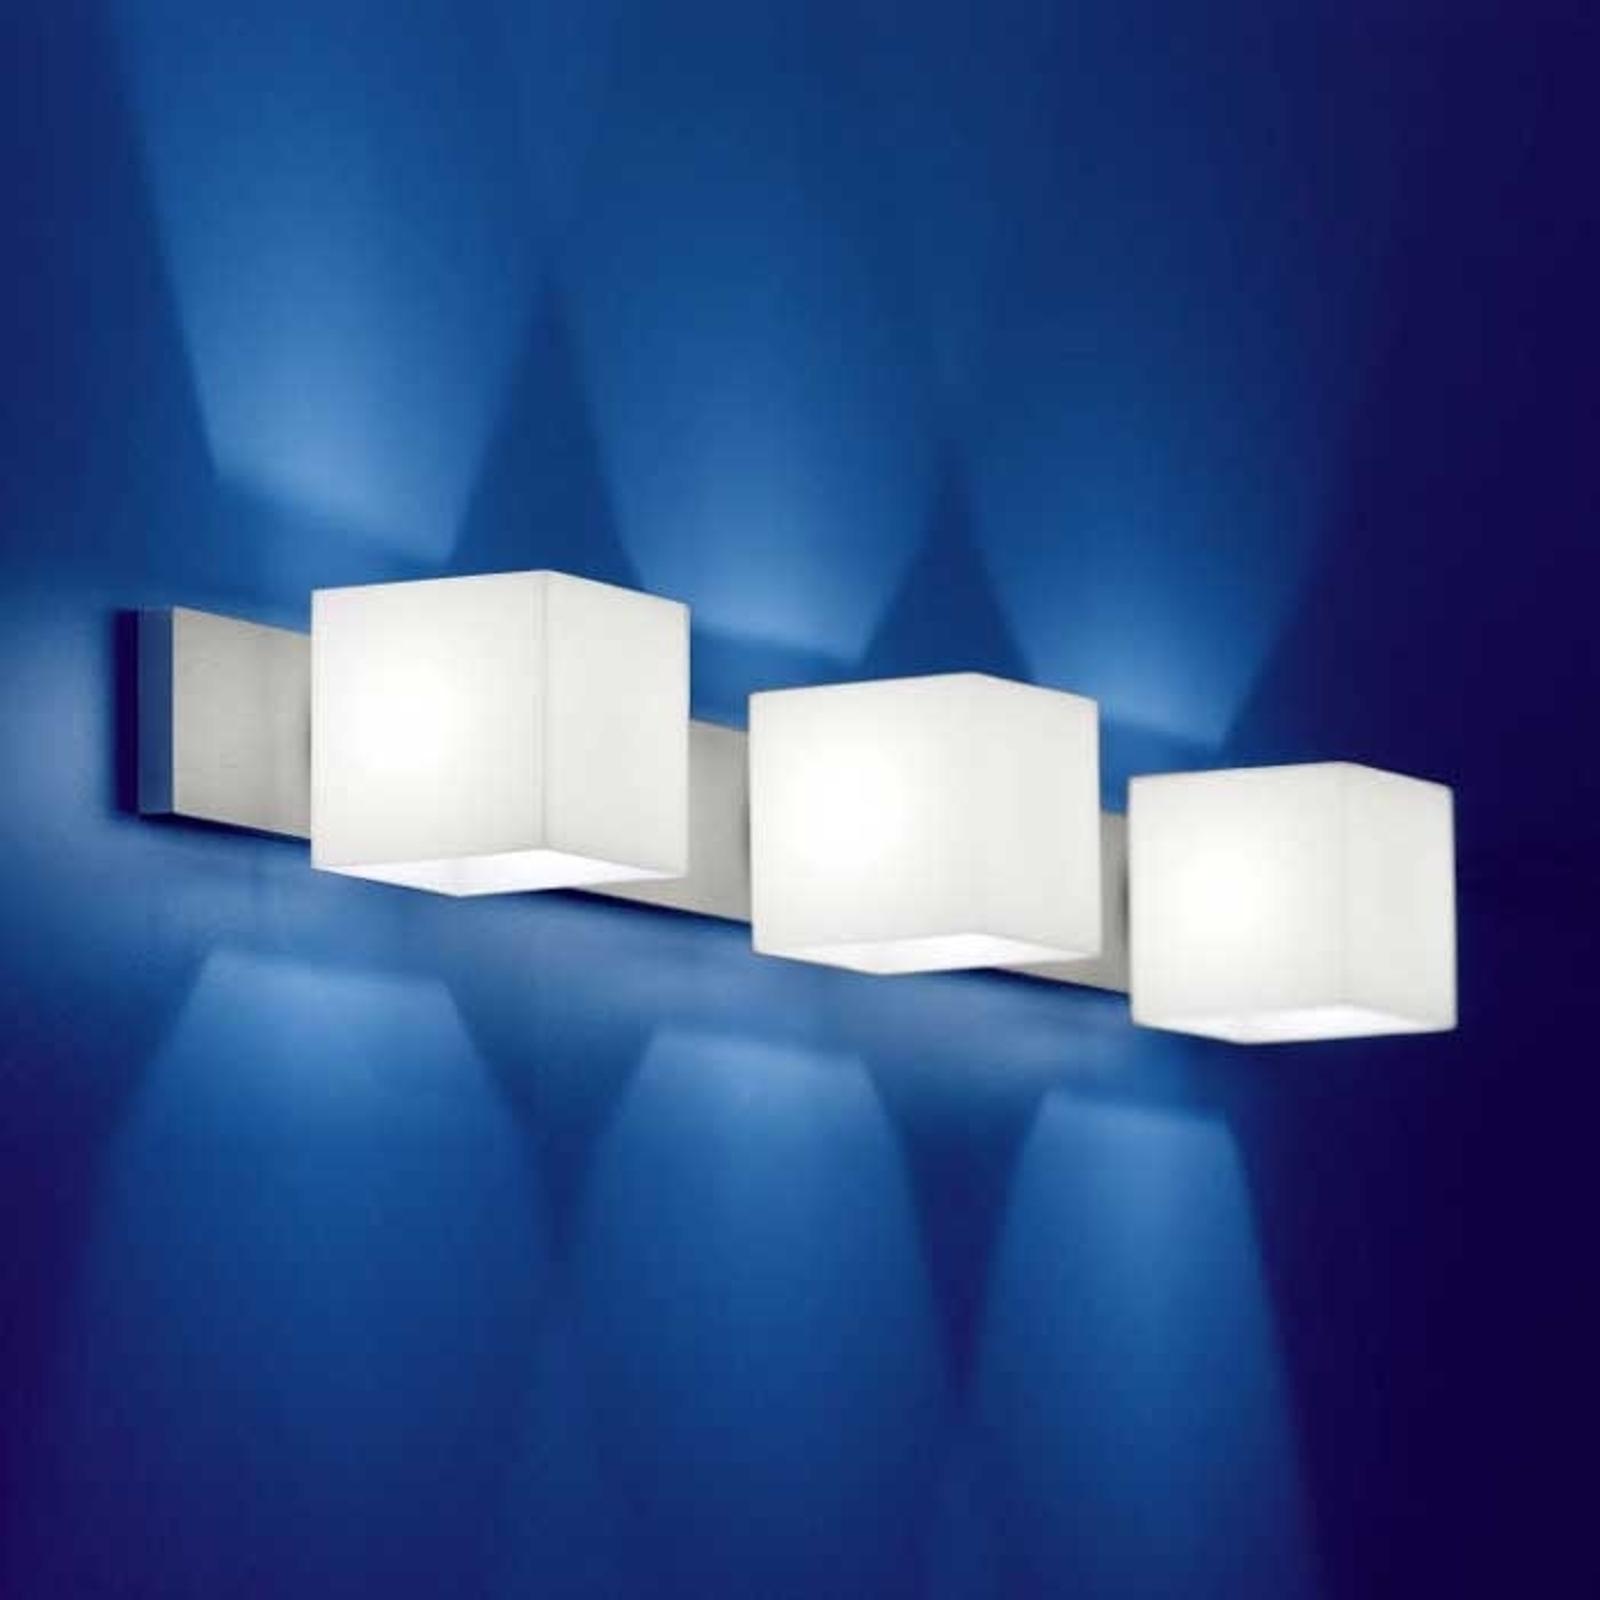 Wandlamp CUBE, 3-lichts met antiverblinding